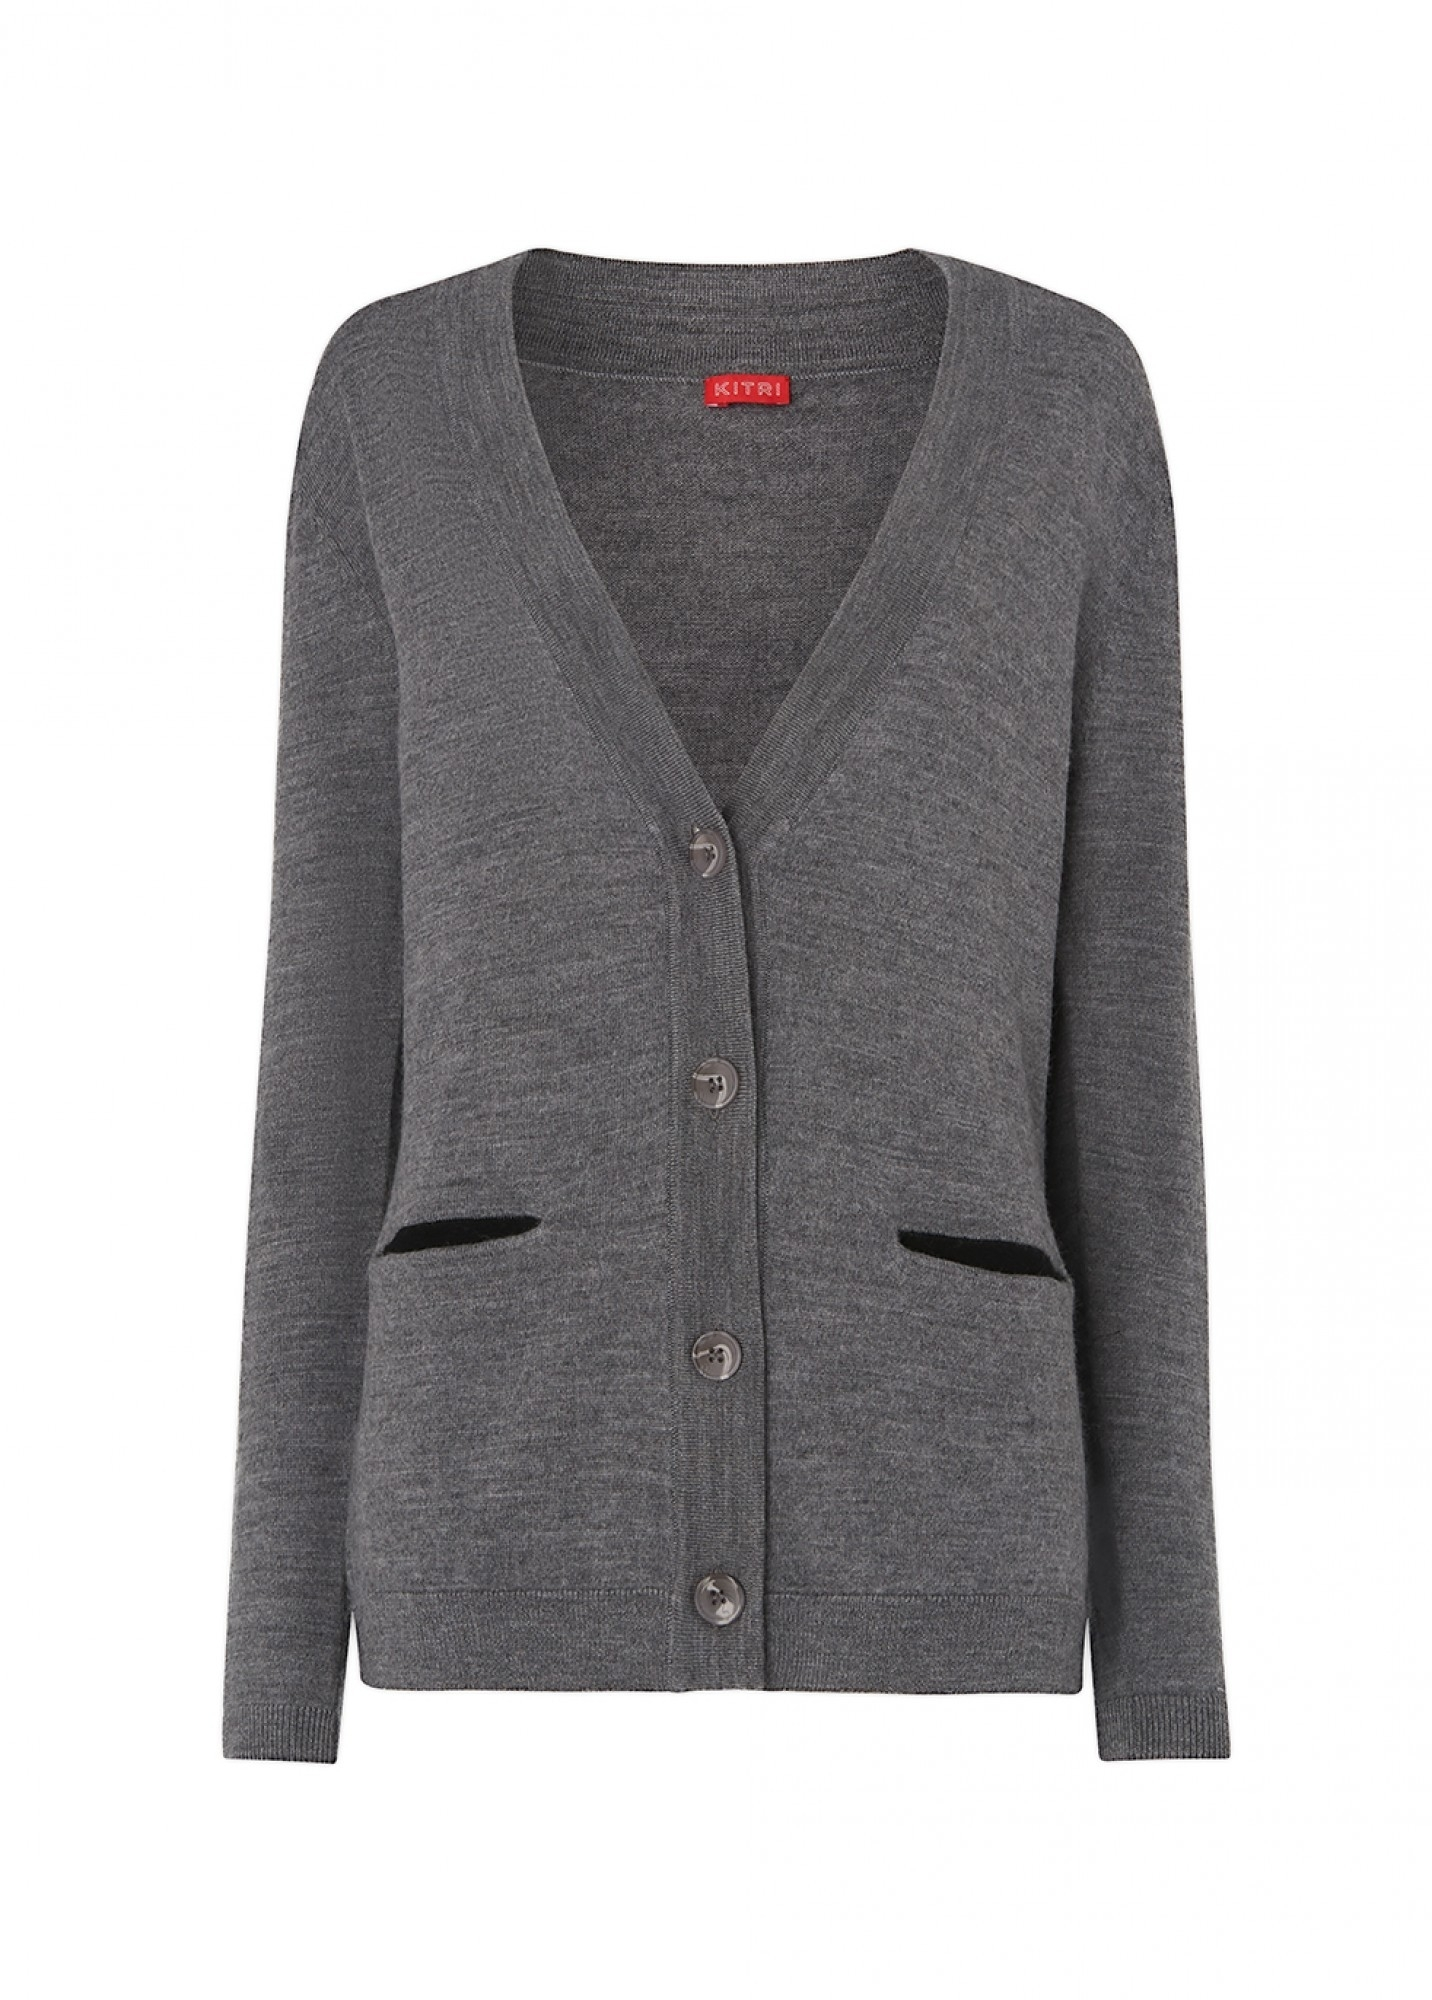 abff09e3cd6d Kitri Knitwear - Womens - Harvey Nichols